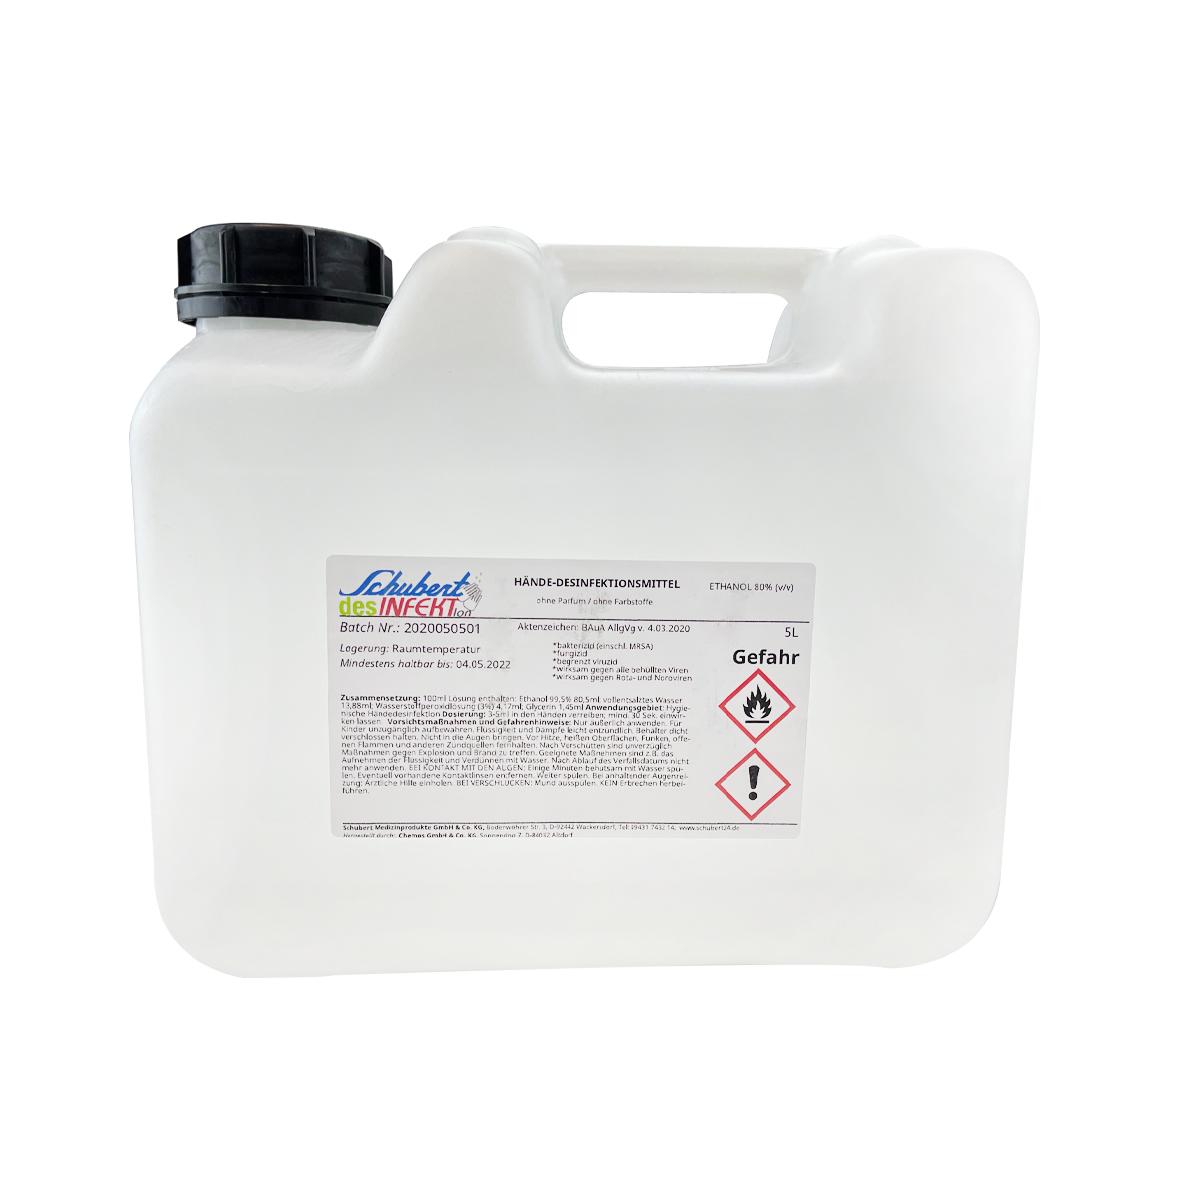 Händedesinfektion - Schubert desINFEKTion - 5 Liter